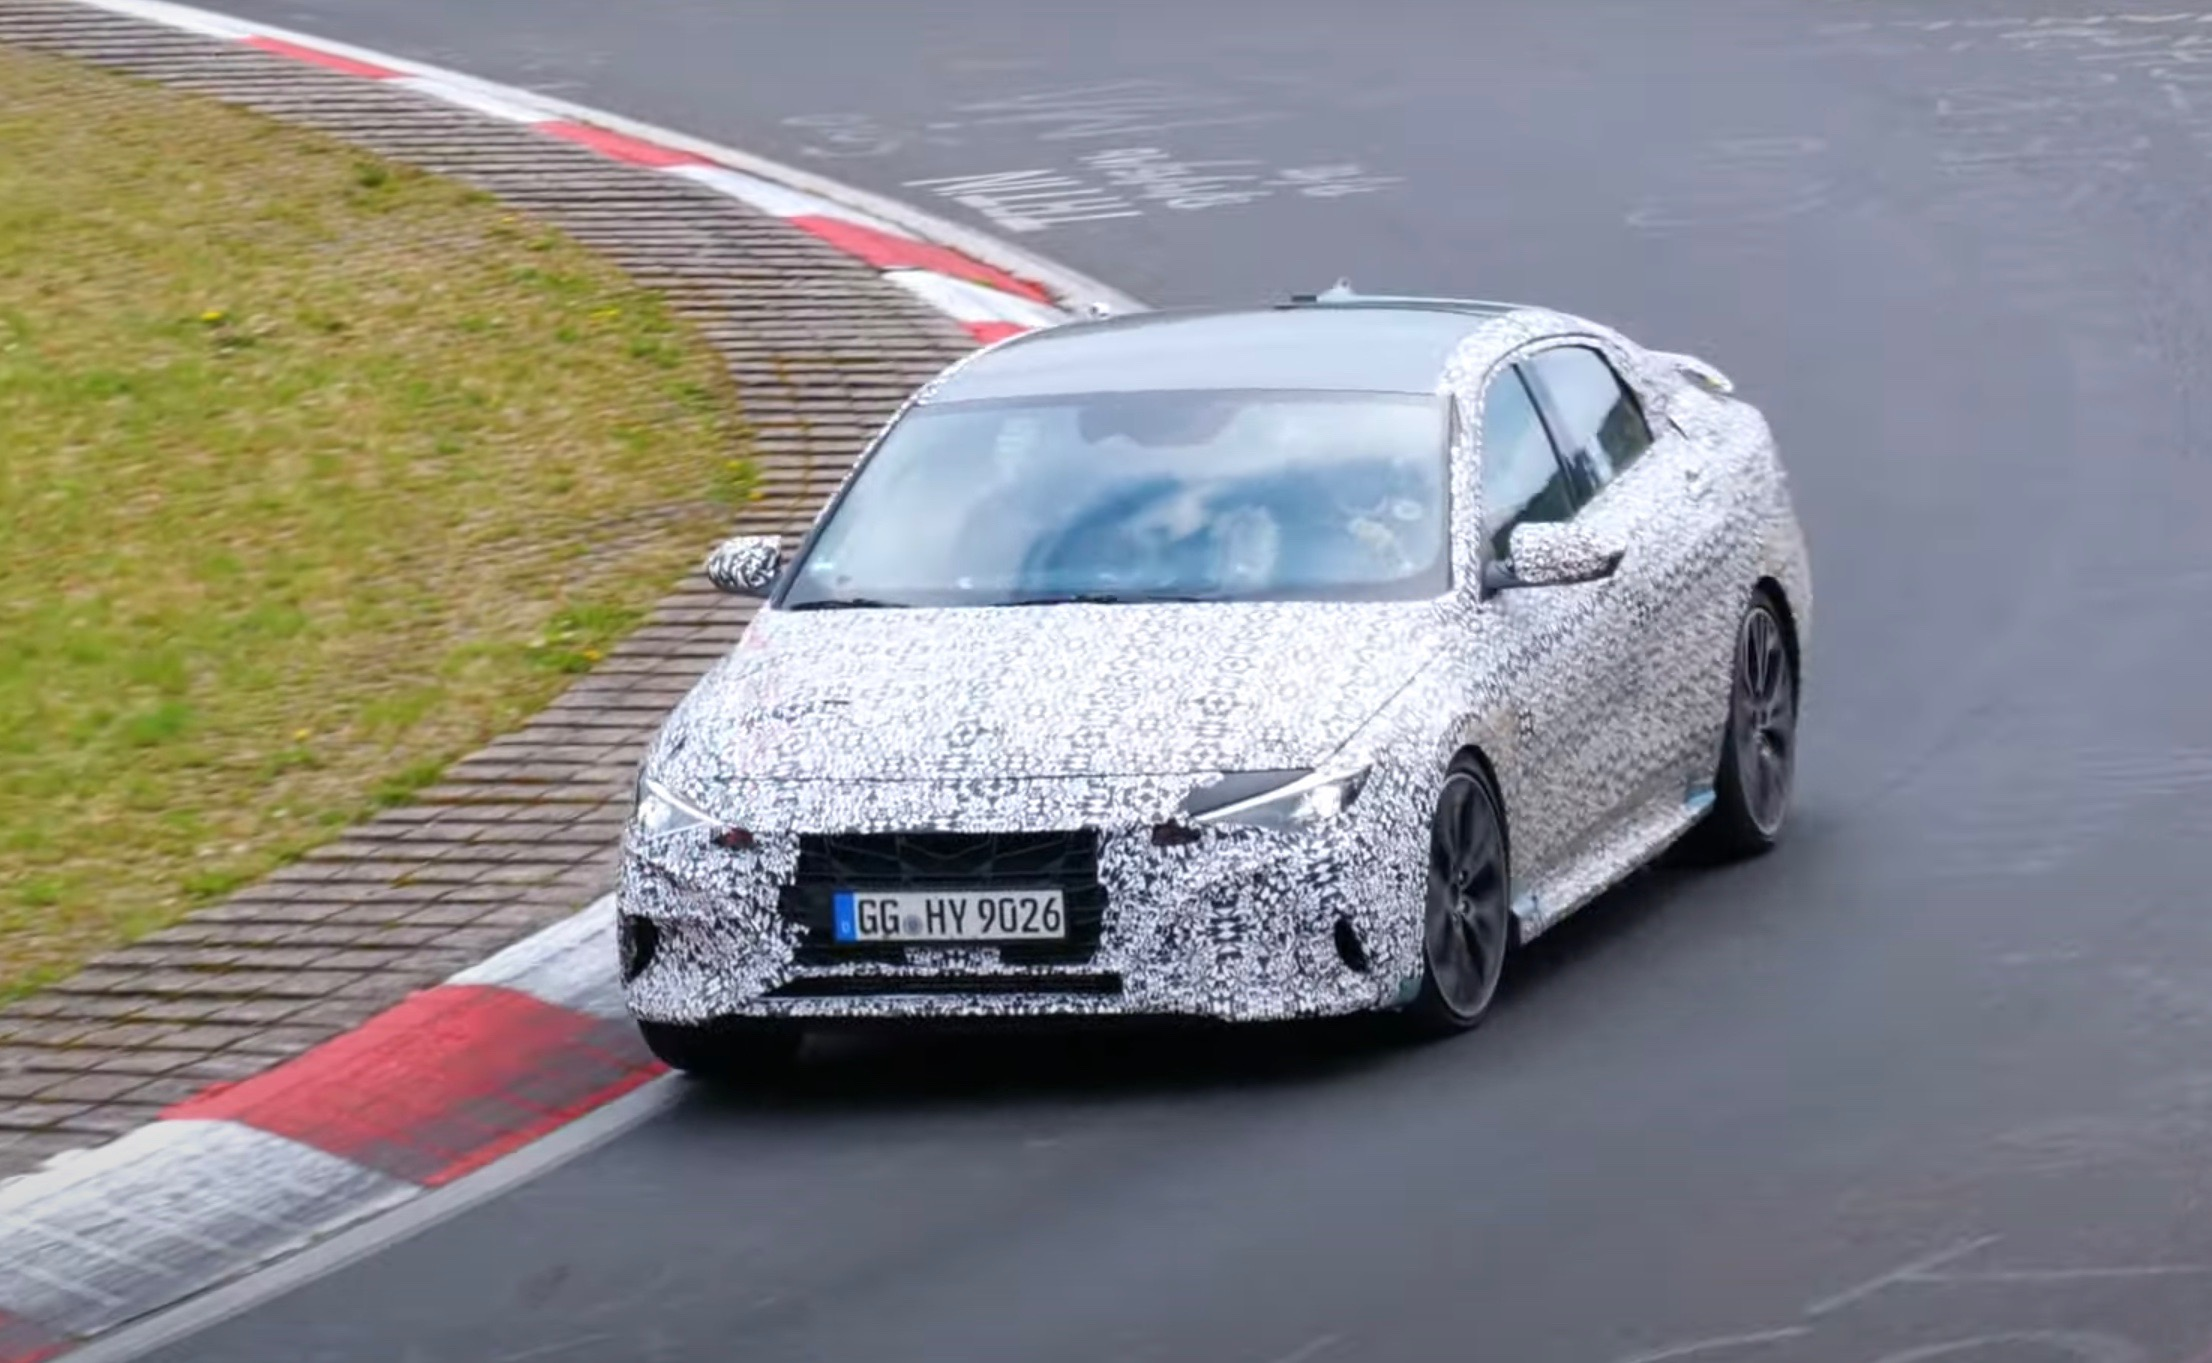 2022 Hyundai i30 Sedan N, aka Elantra N, spotted at Nurburgring (video)